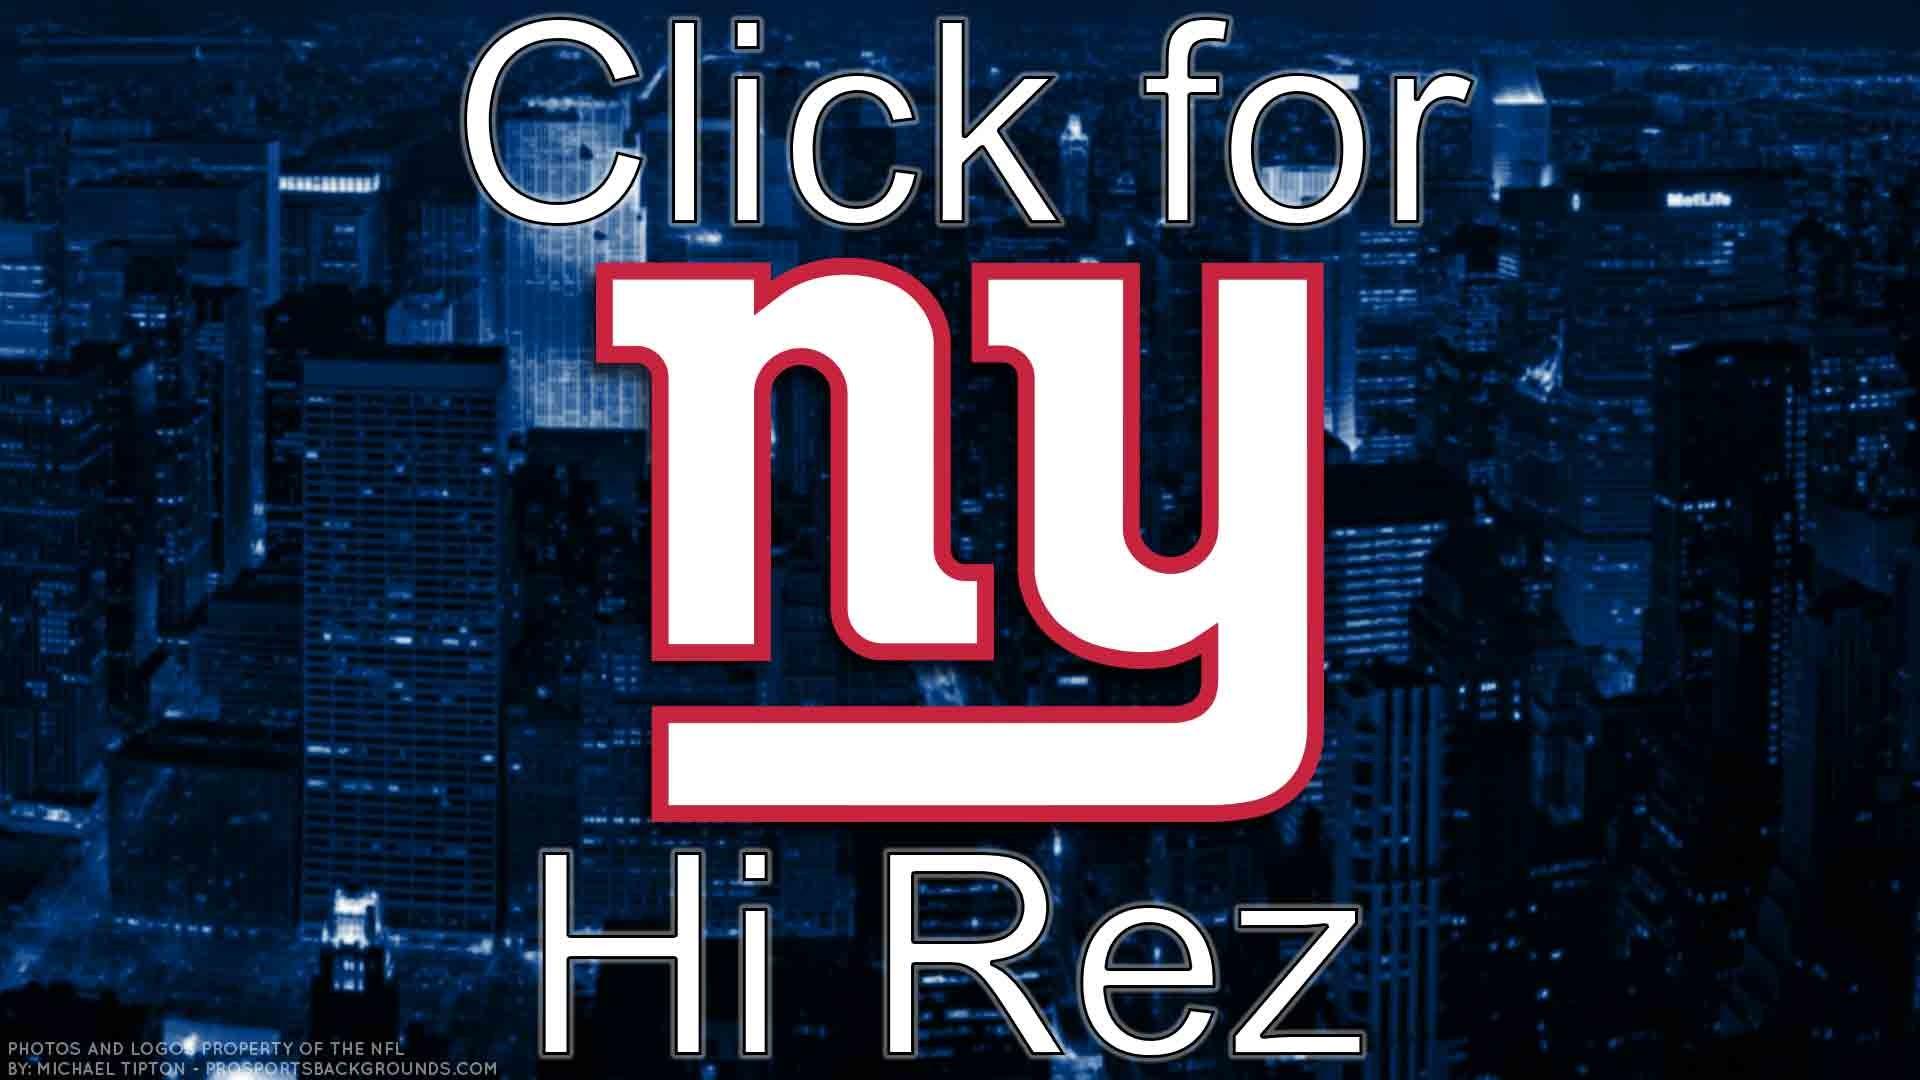 … New York Giants 2017 football logo wallpaper pc desktop computer